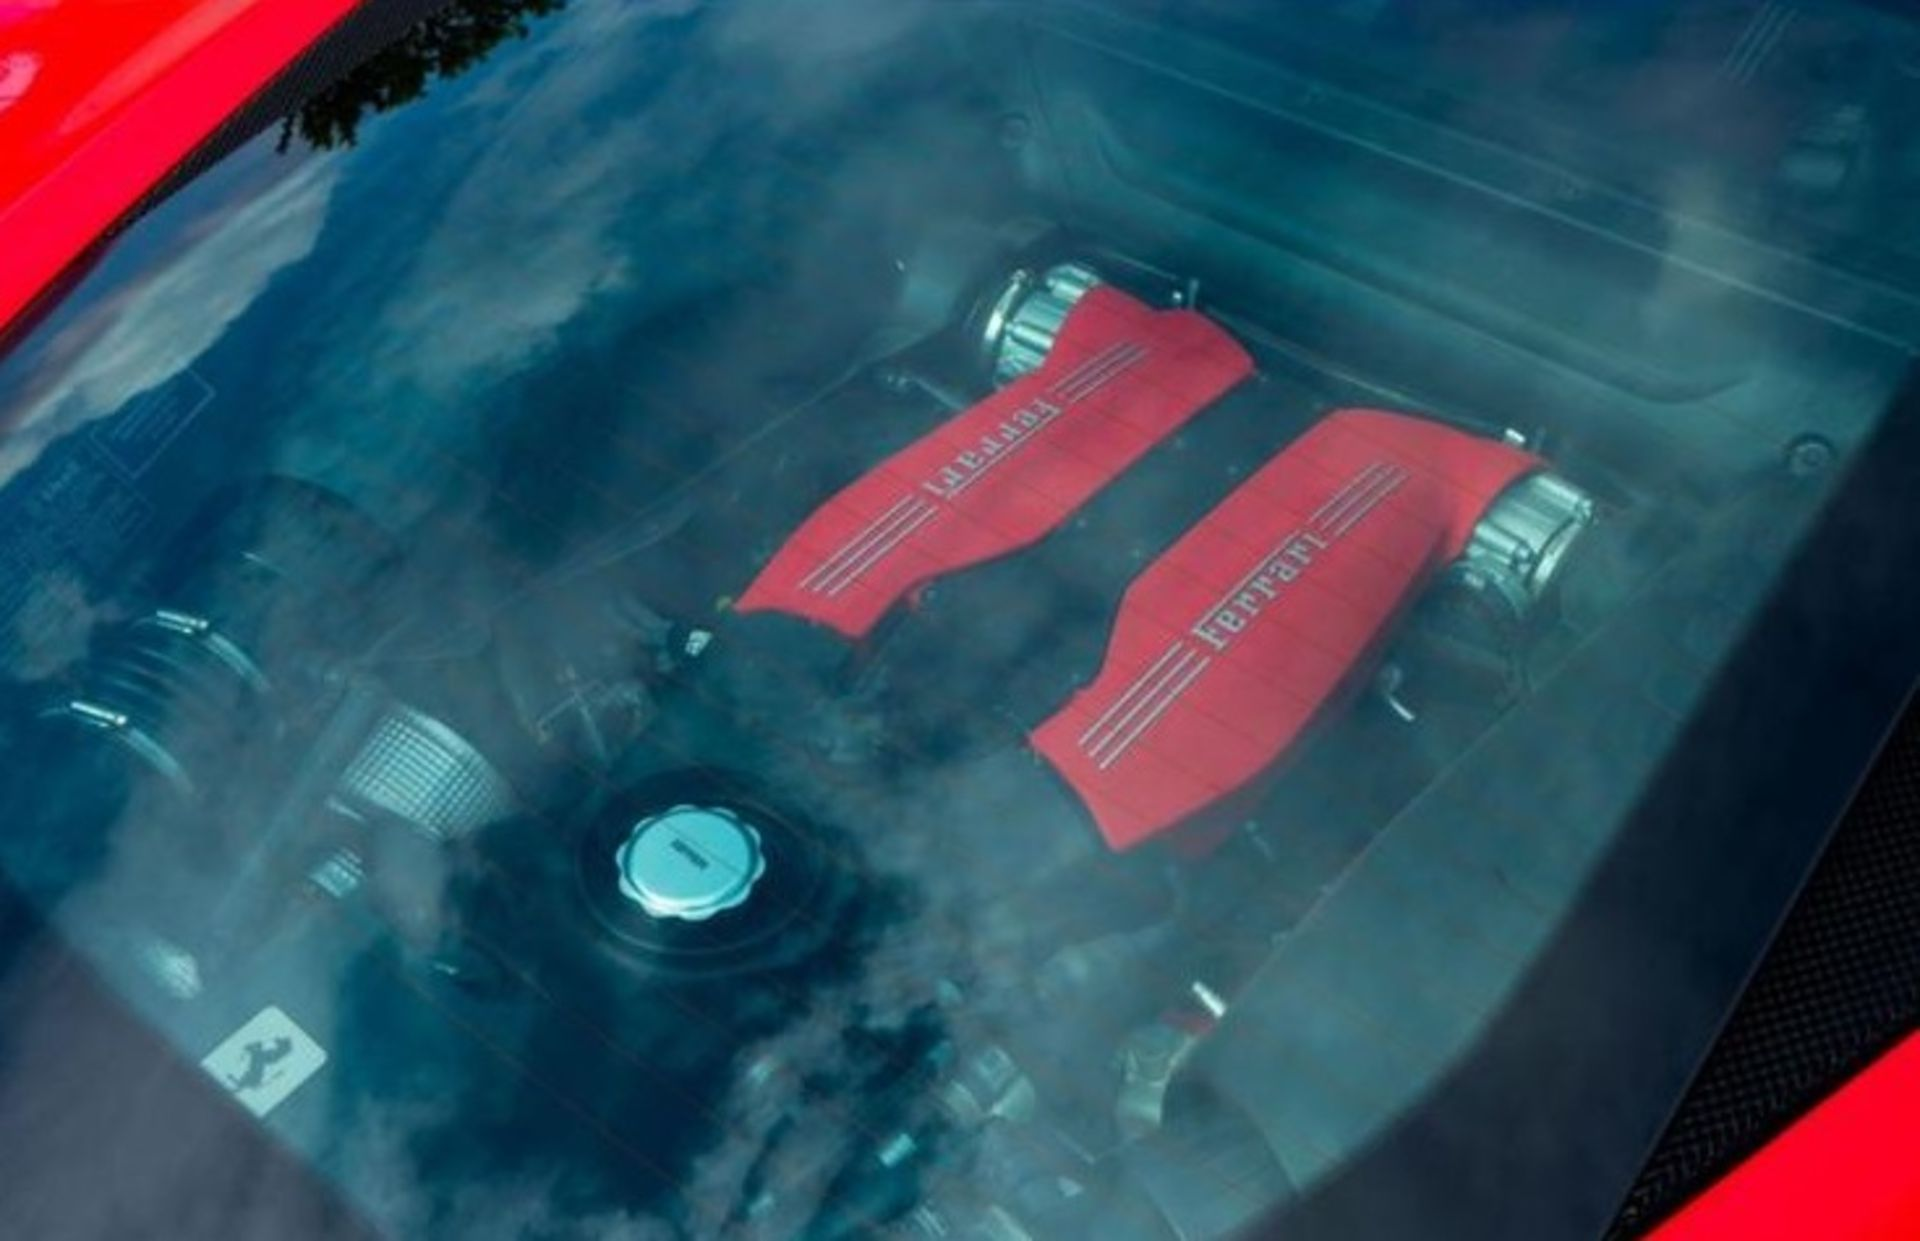 2016 FERRARI 488 GTB 2DR RED COUPE, PETROL, AUTOMATIC, 11K MILES, LEFT HAND DRIVE *NO VAT* - Image 17 of 22